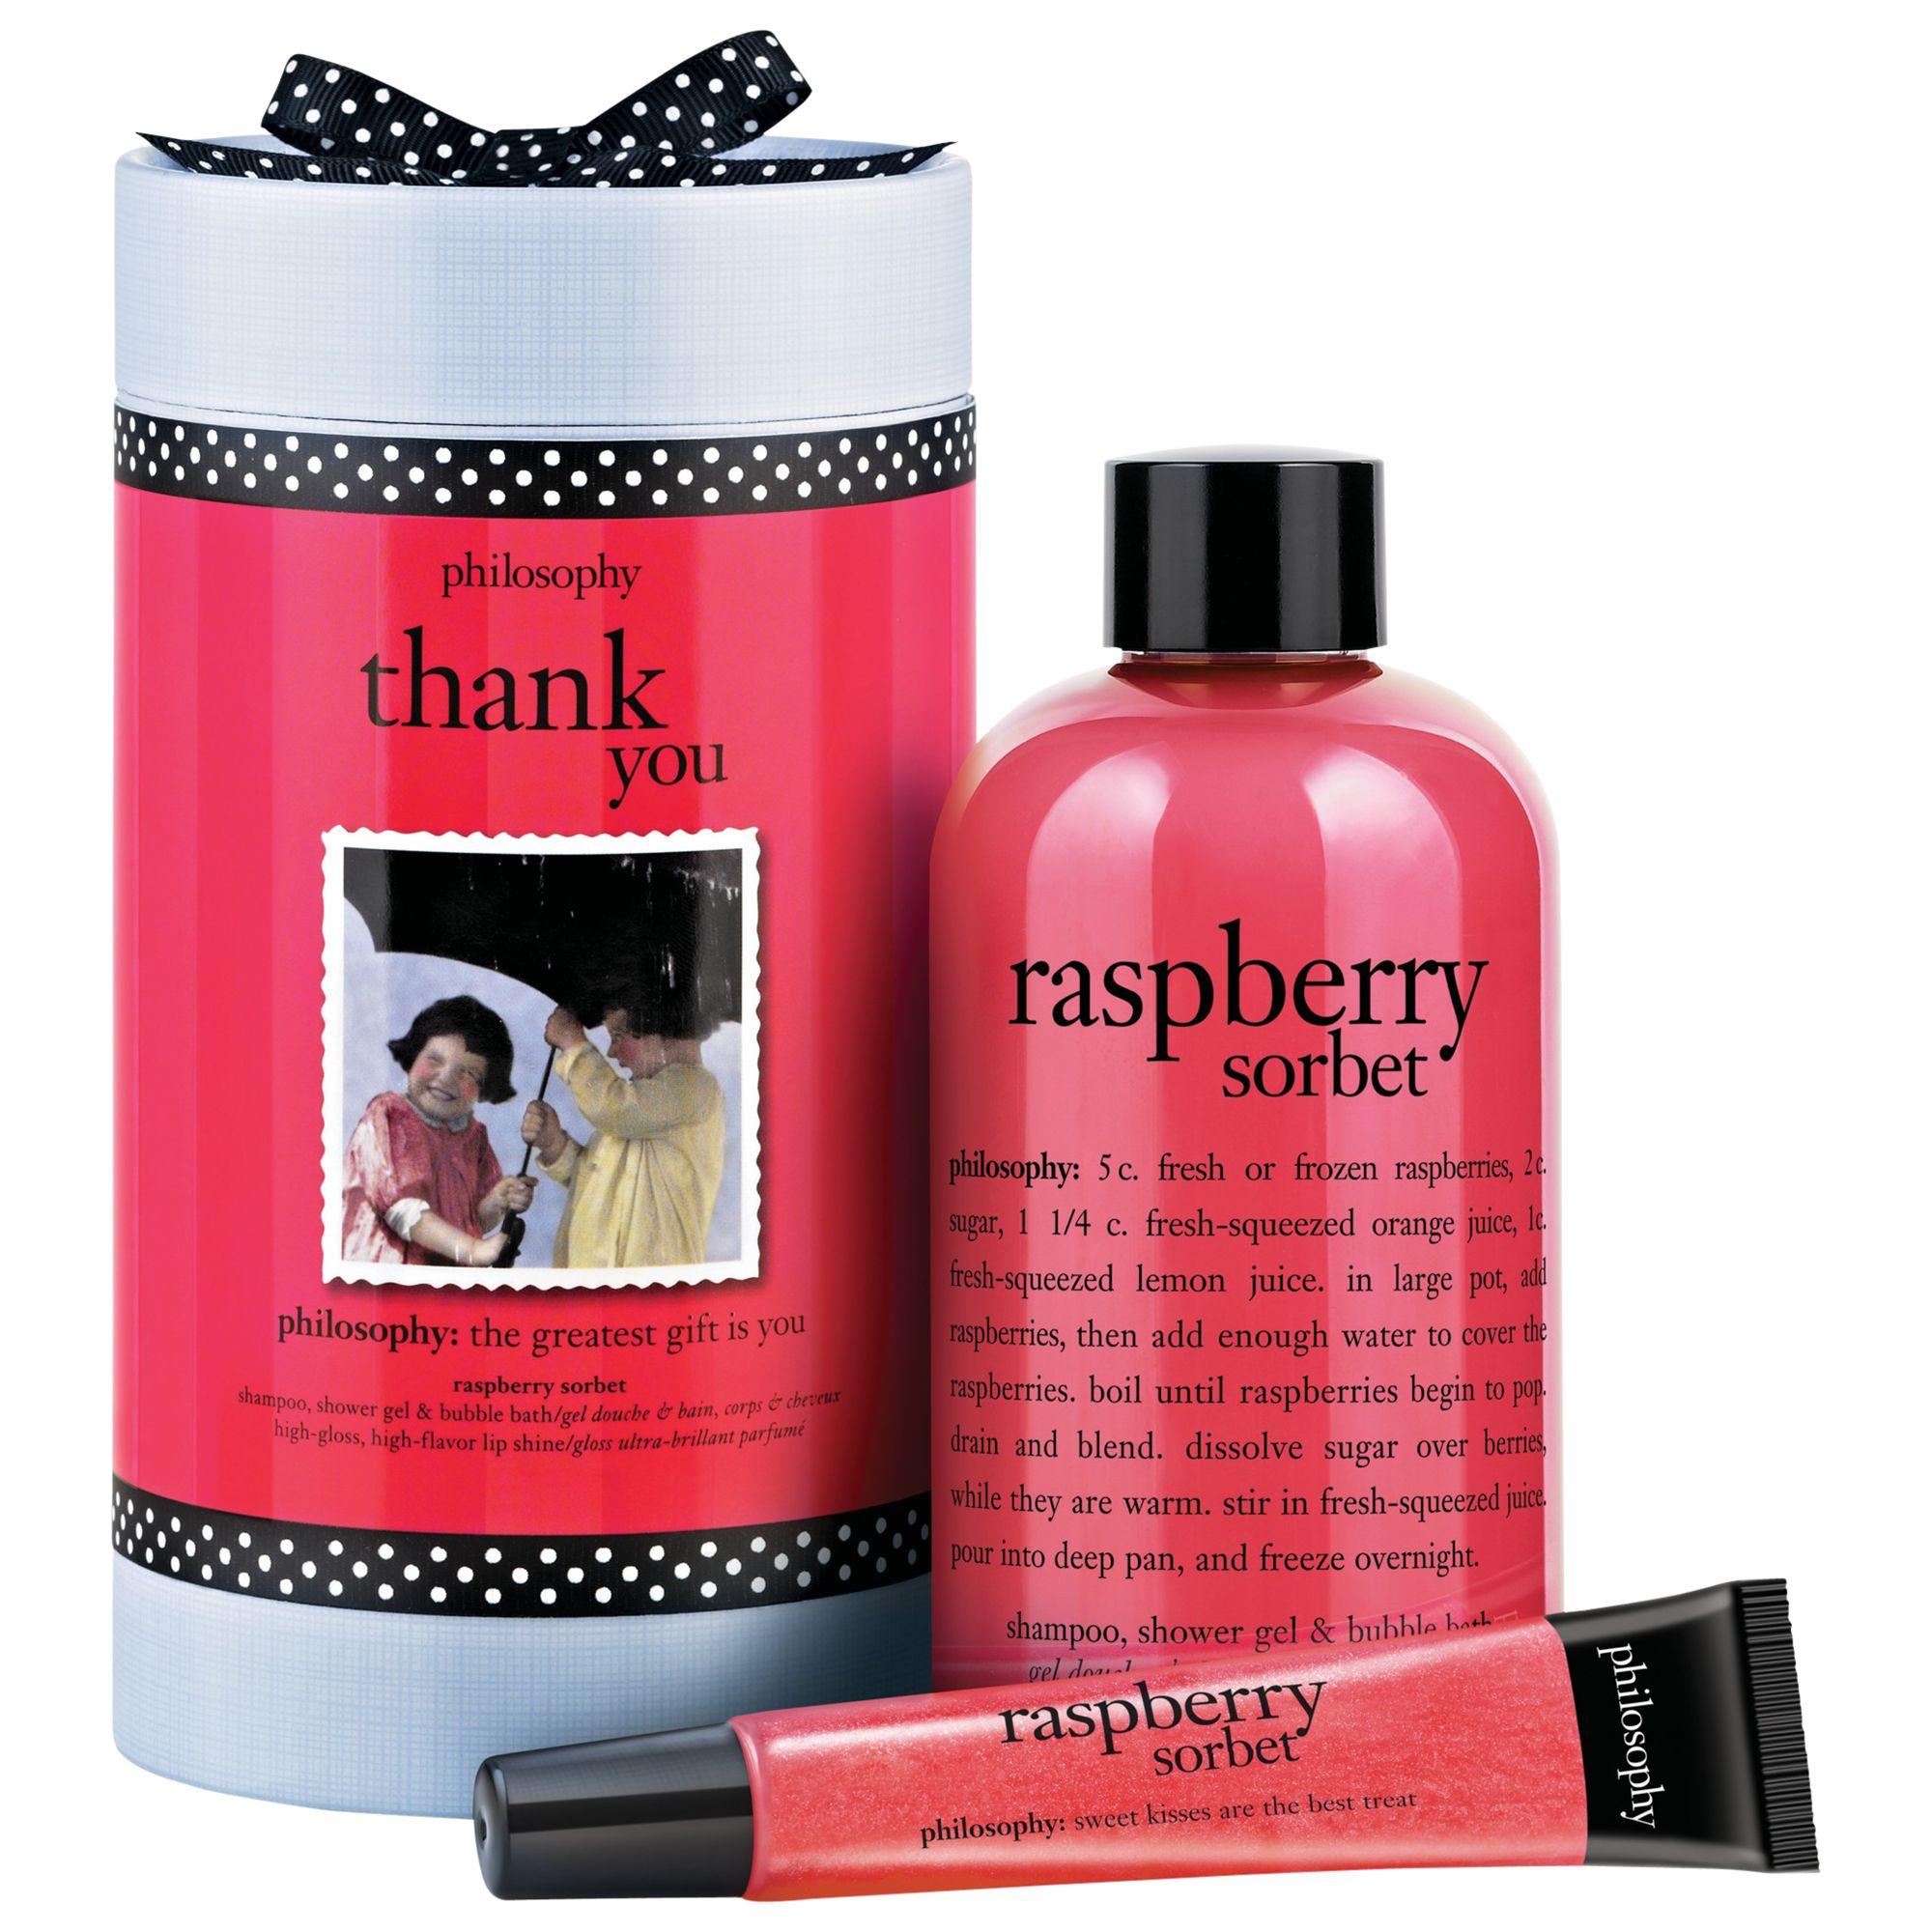 Philosophy Philosophy Raspberry Thank You Bath & Body Gift Set